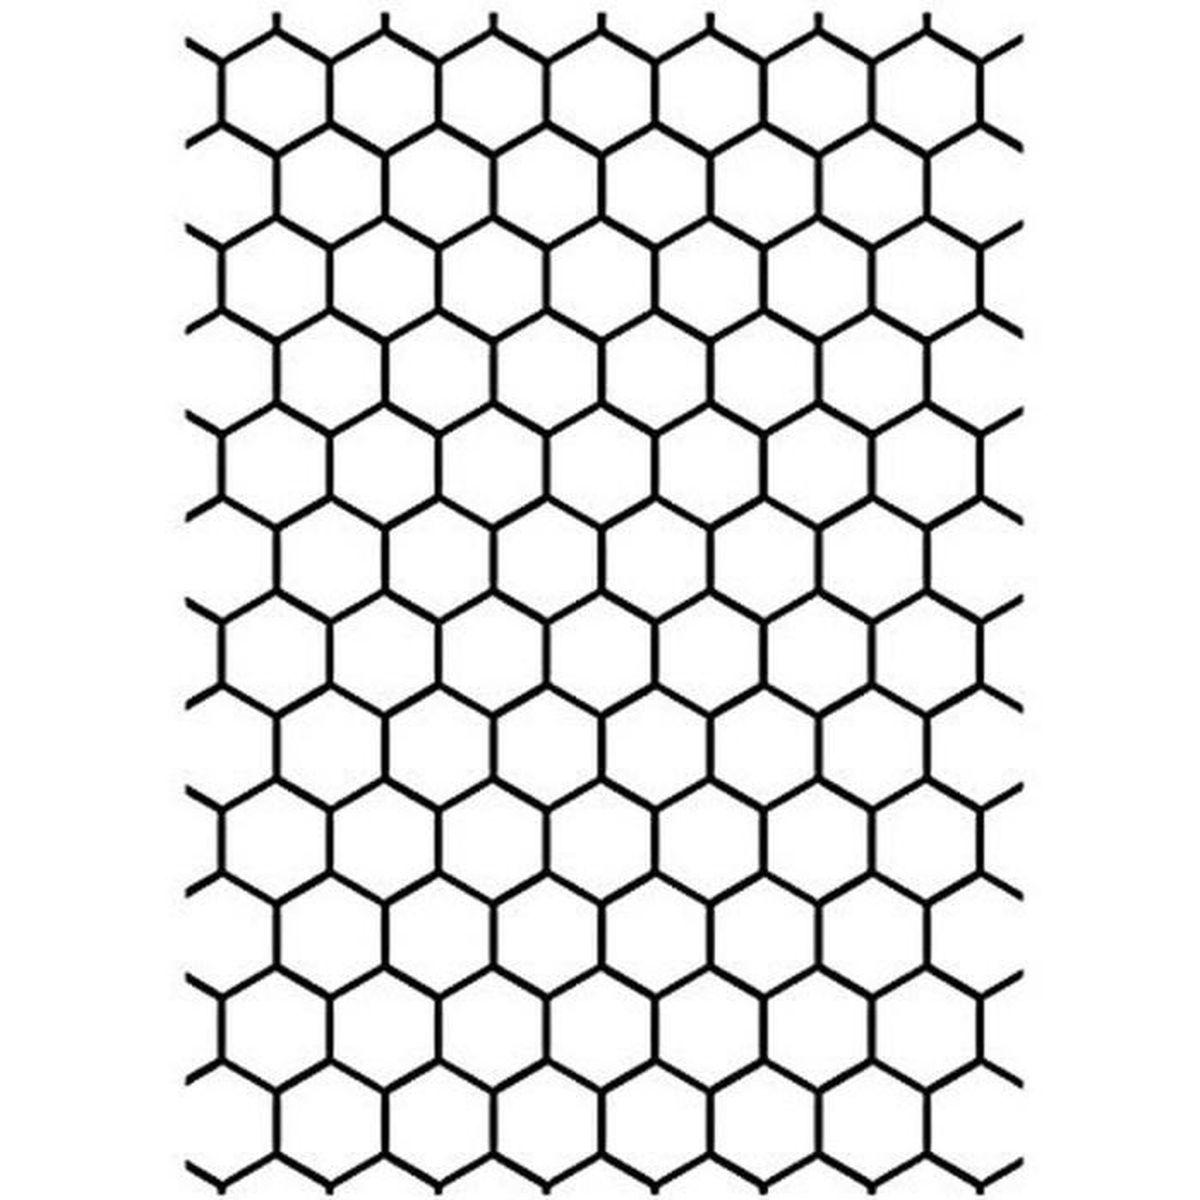 14,6 x 10,8 x 0,5 cm Plastique Transparent Darice 30032530 Pochoir pour Gaufrage Carte USA